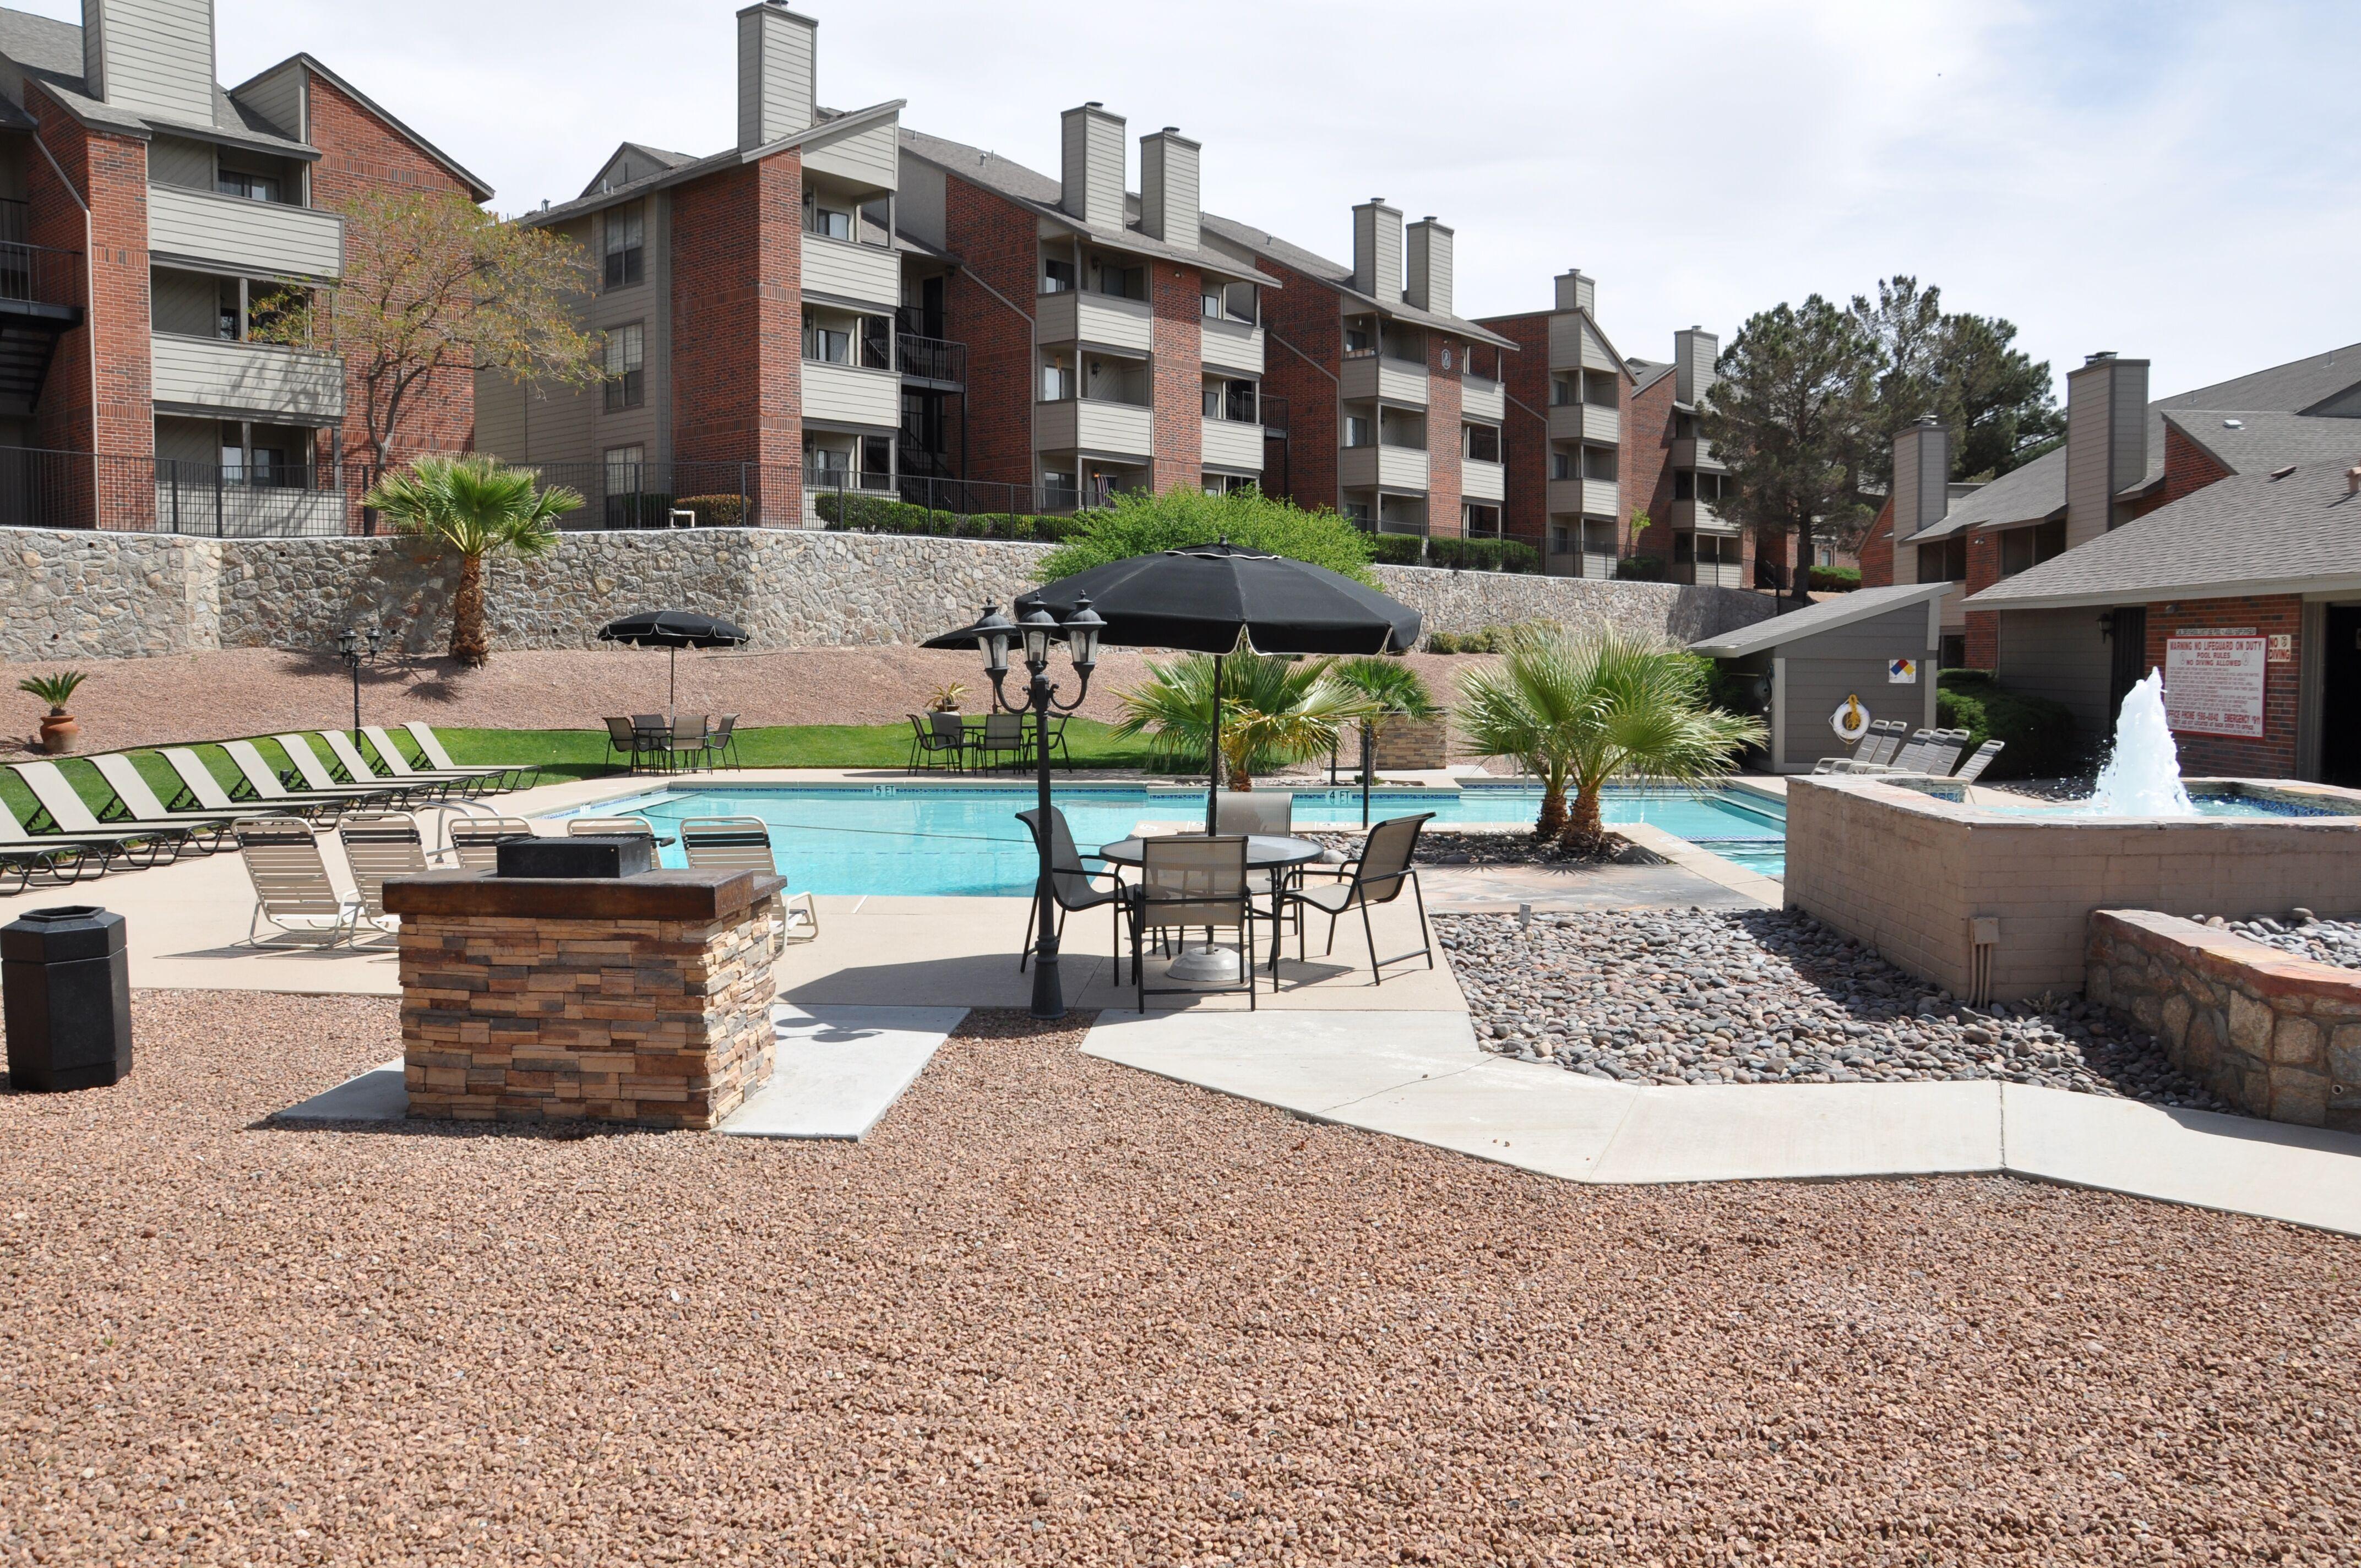 Apartments Near UTEP High Ridge Apts. for University of Texas at El Paso Students in El Paso, TX